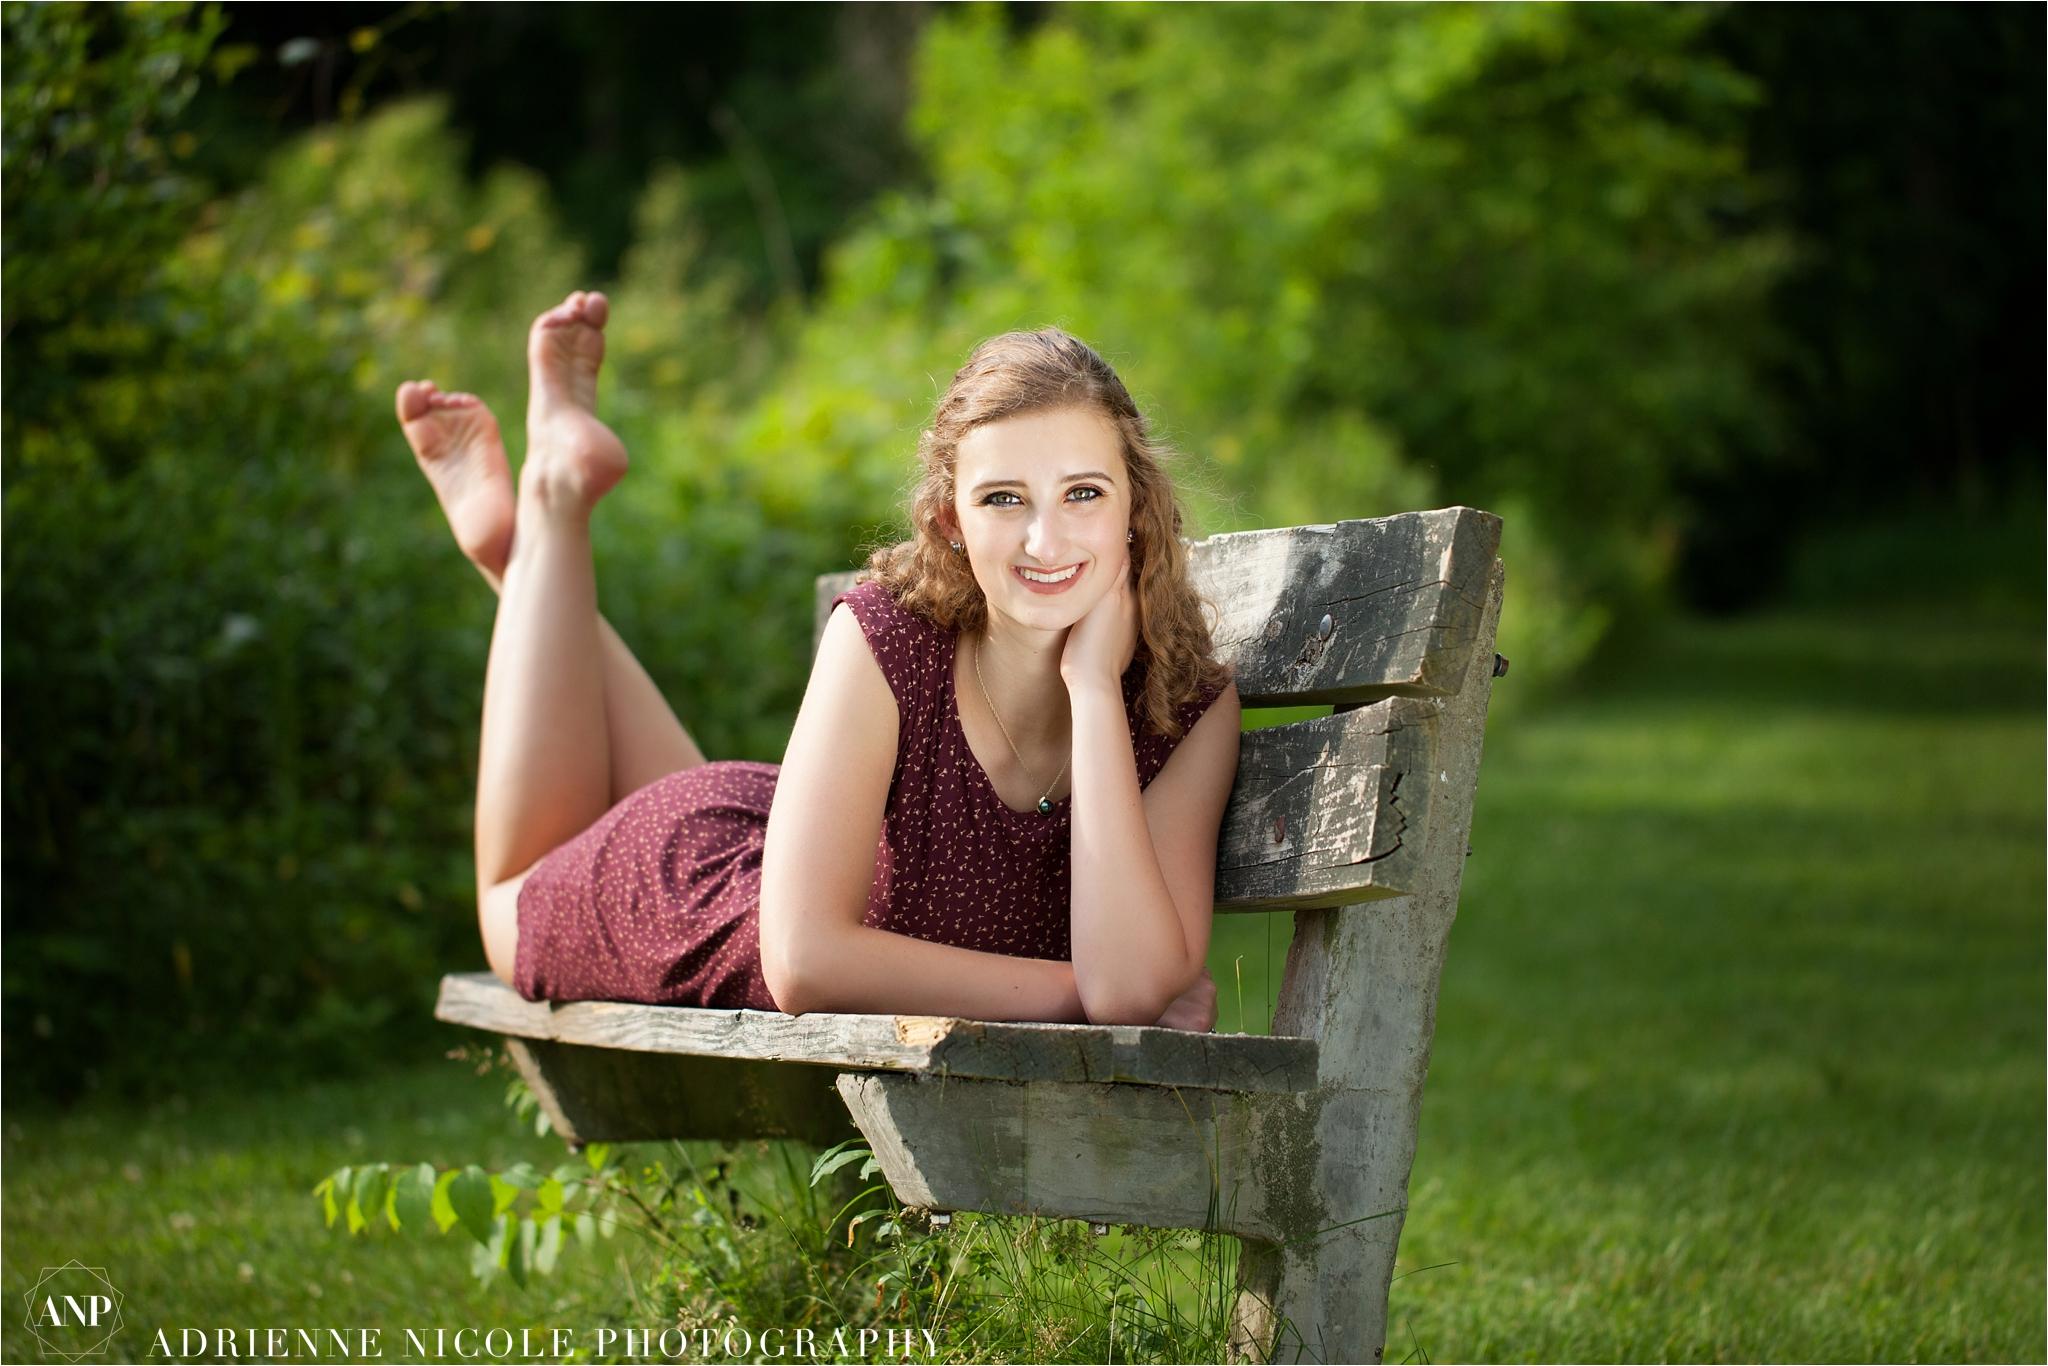 AdrienneNicolePhotography_0262.jpg